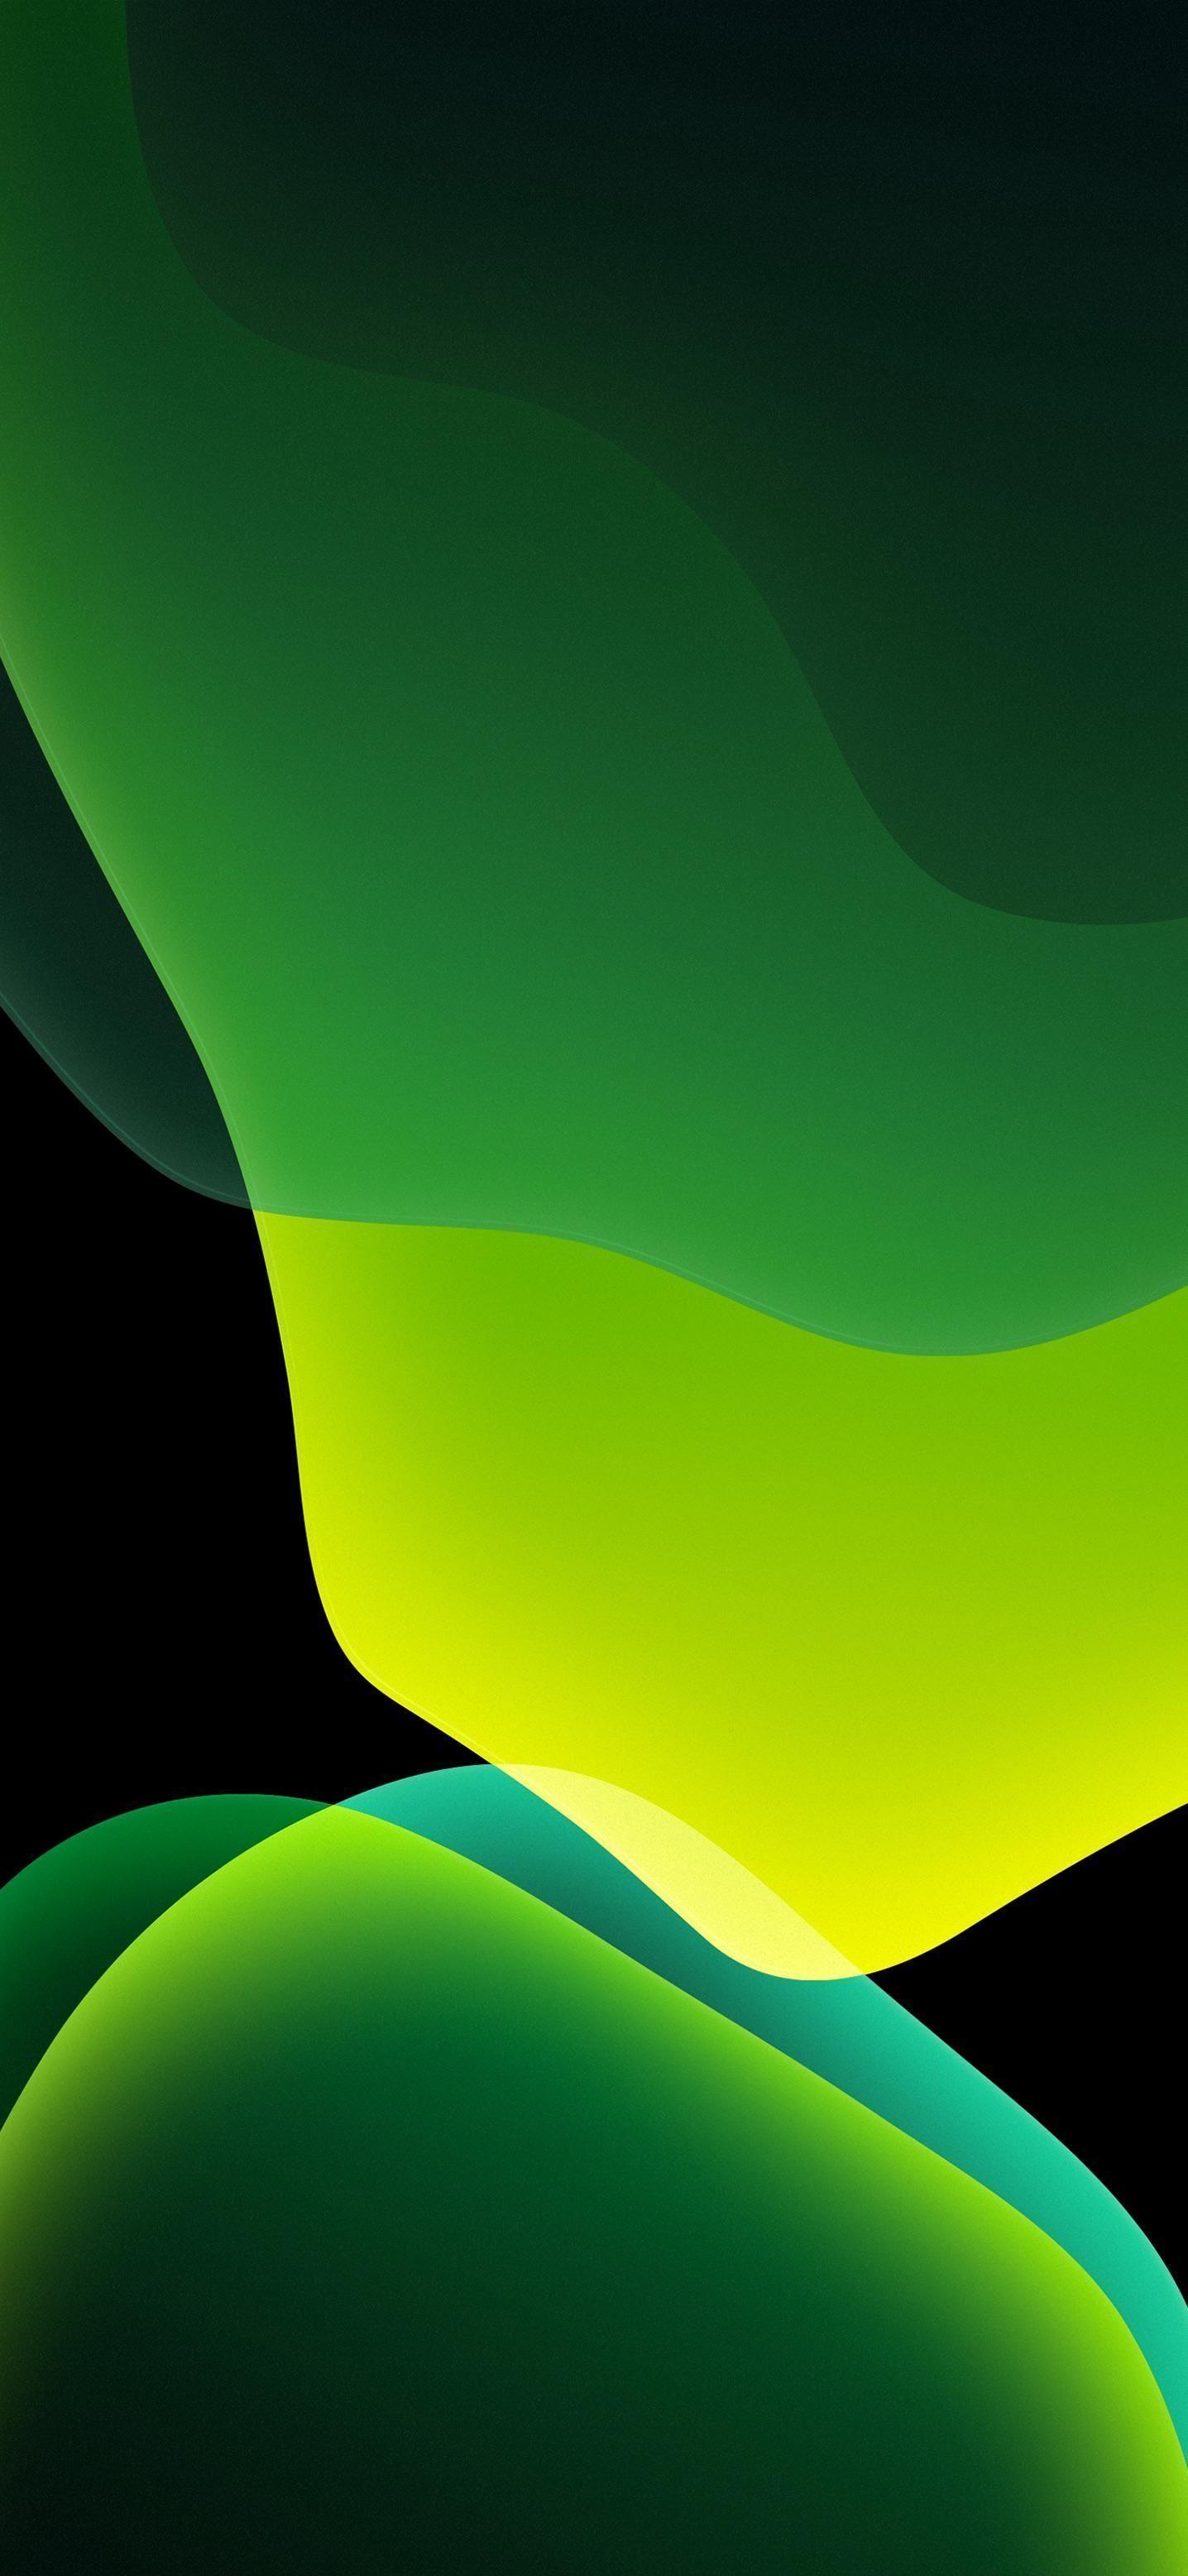 Green Ios 13 Dark Mode Wallpaper Iphone Wallpaper Ios Iphone